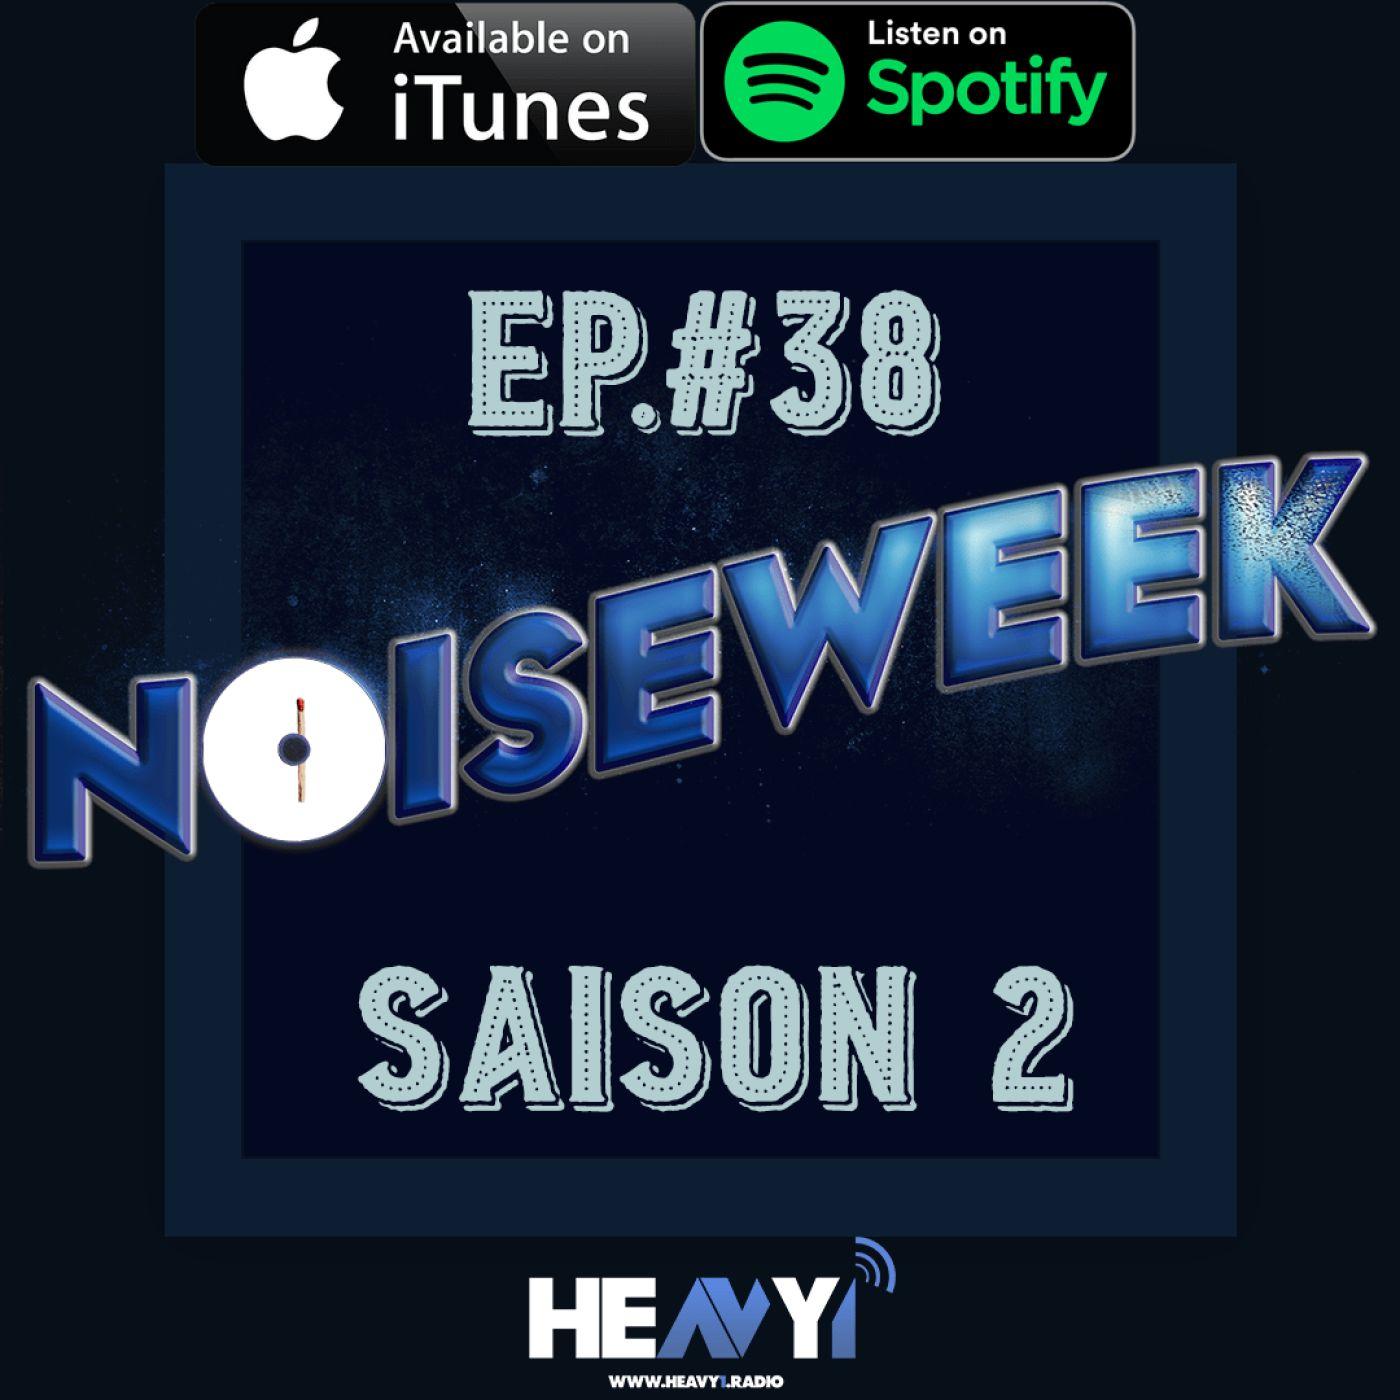 Noiseweek #38 Saison 2